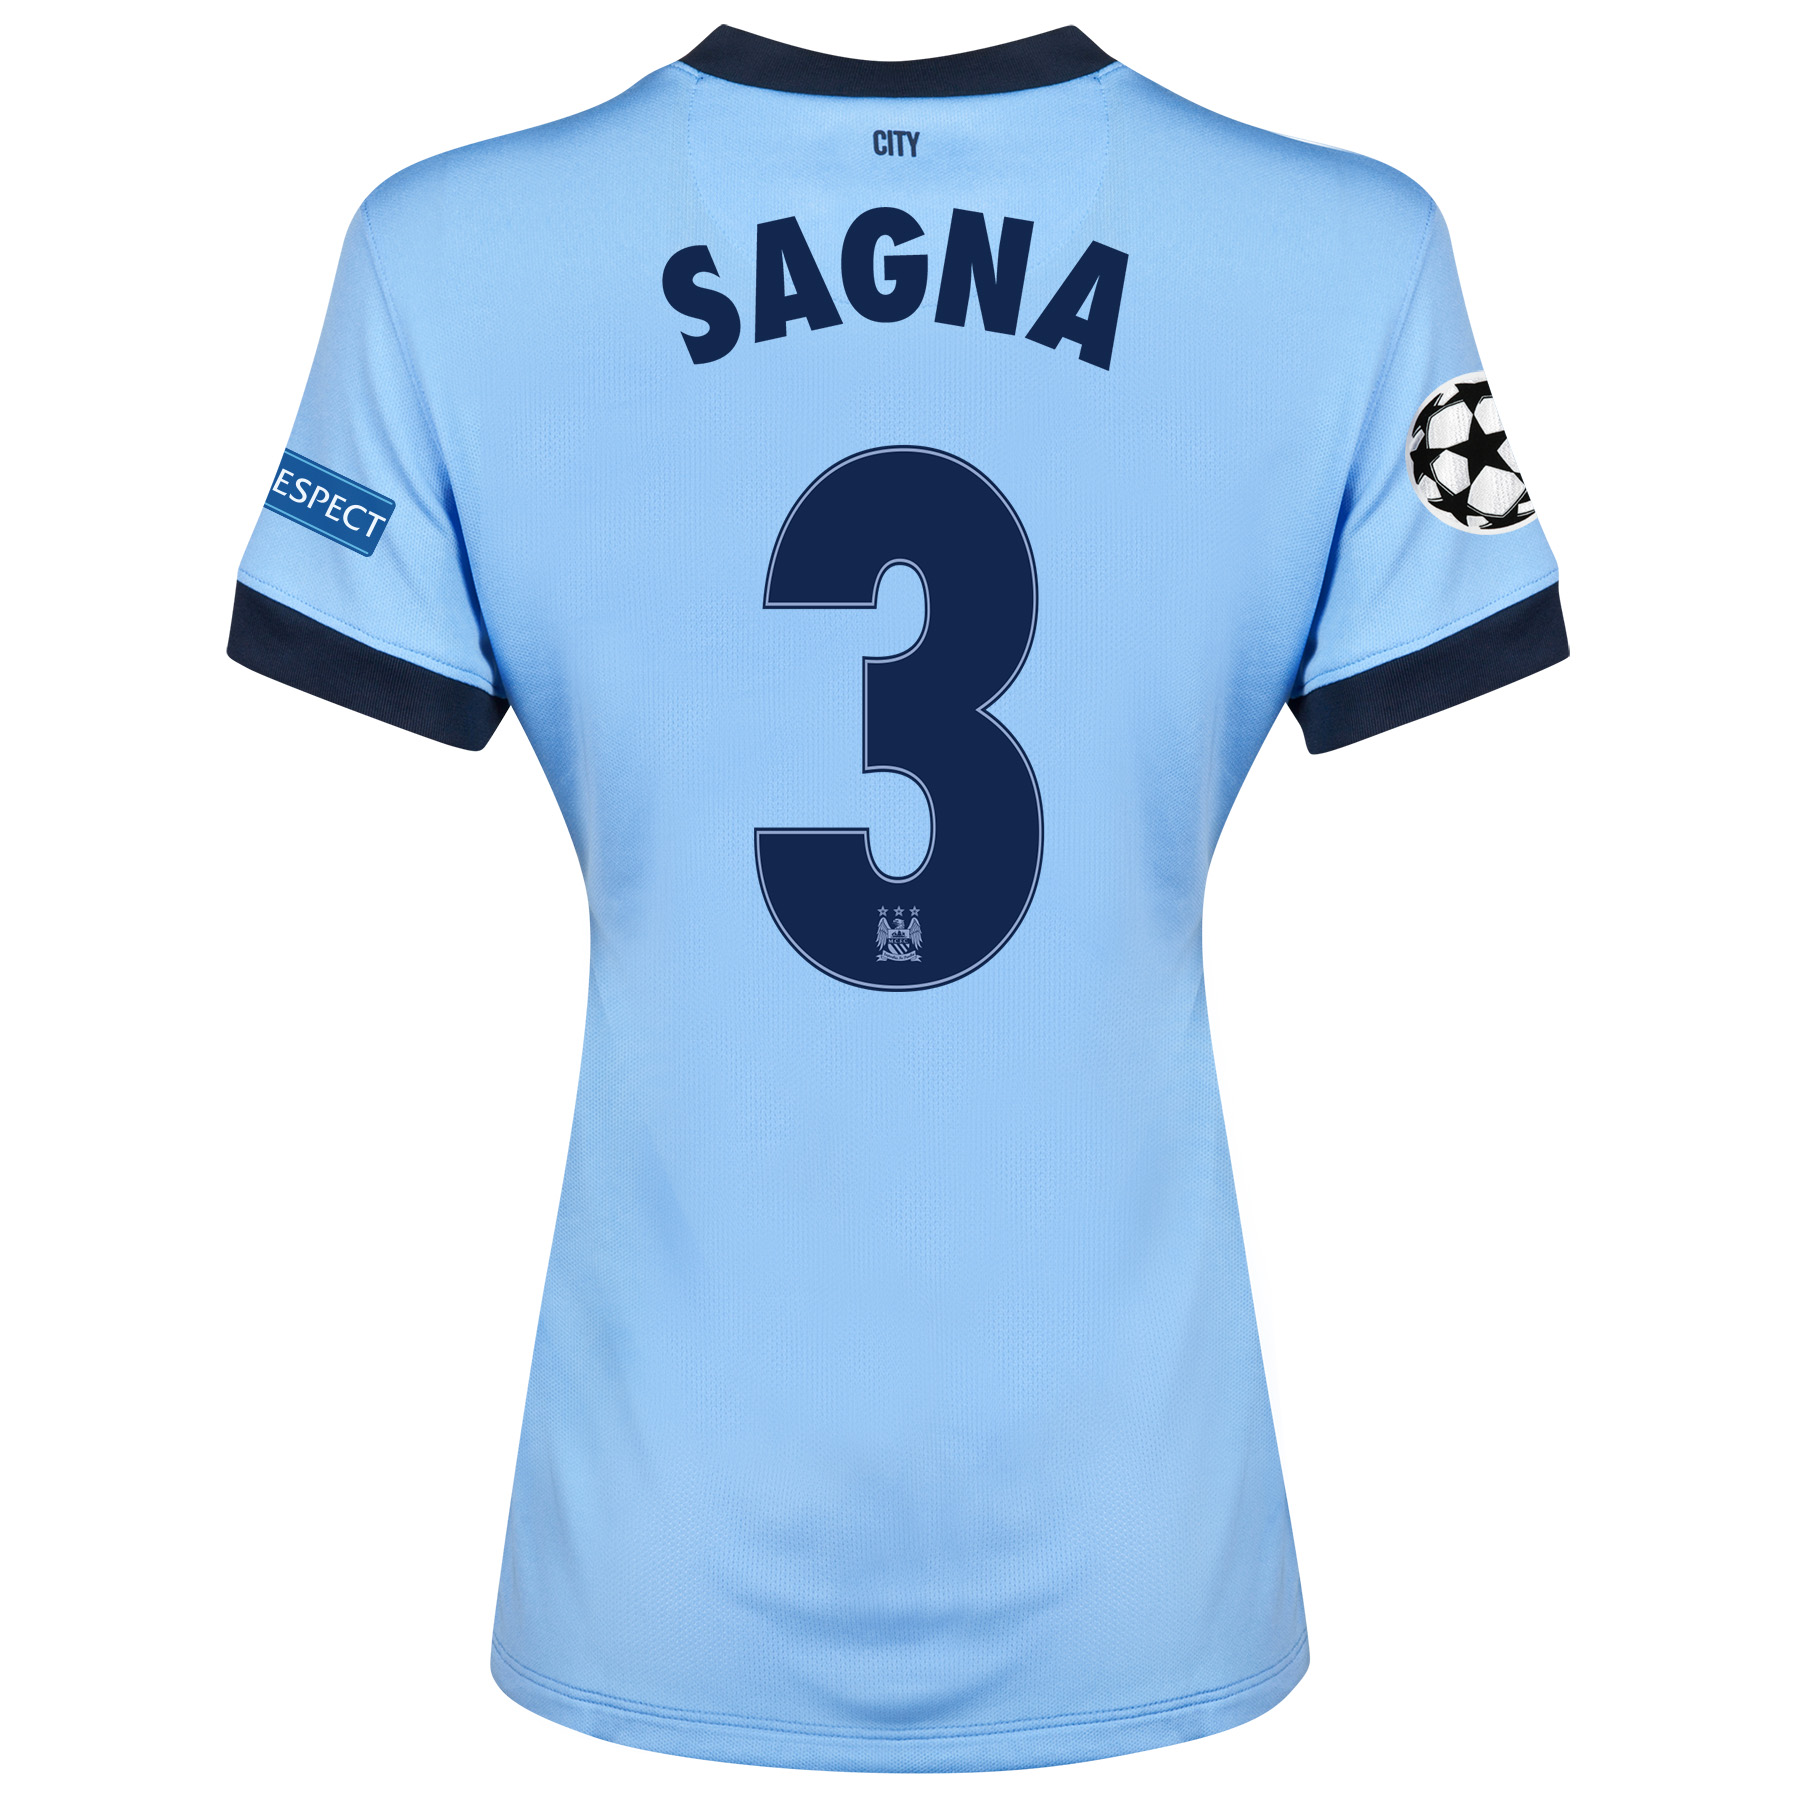 Manchester City UEFA Champions League Home Shirt 2014/15 - Womens Sky Blue with Sagna 3 printing